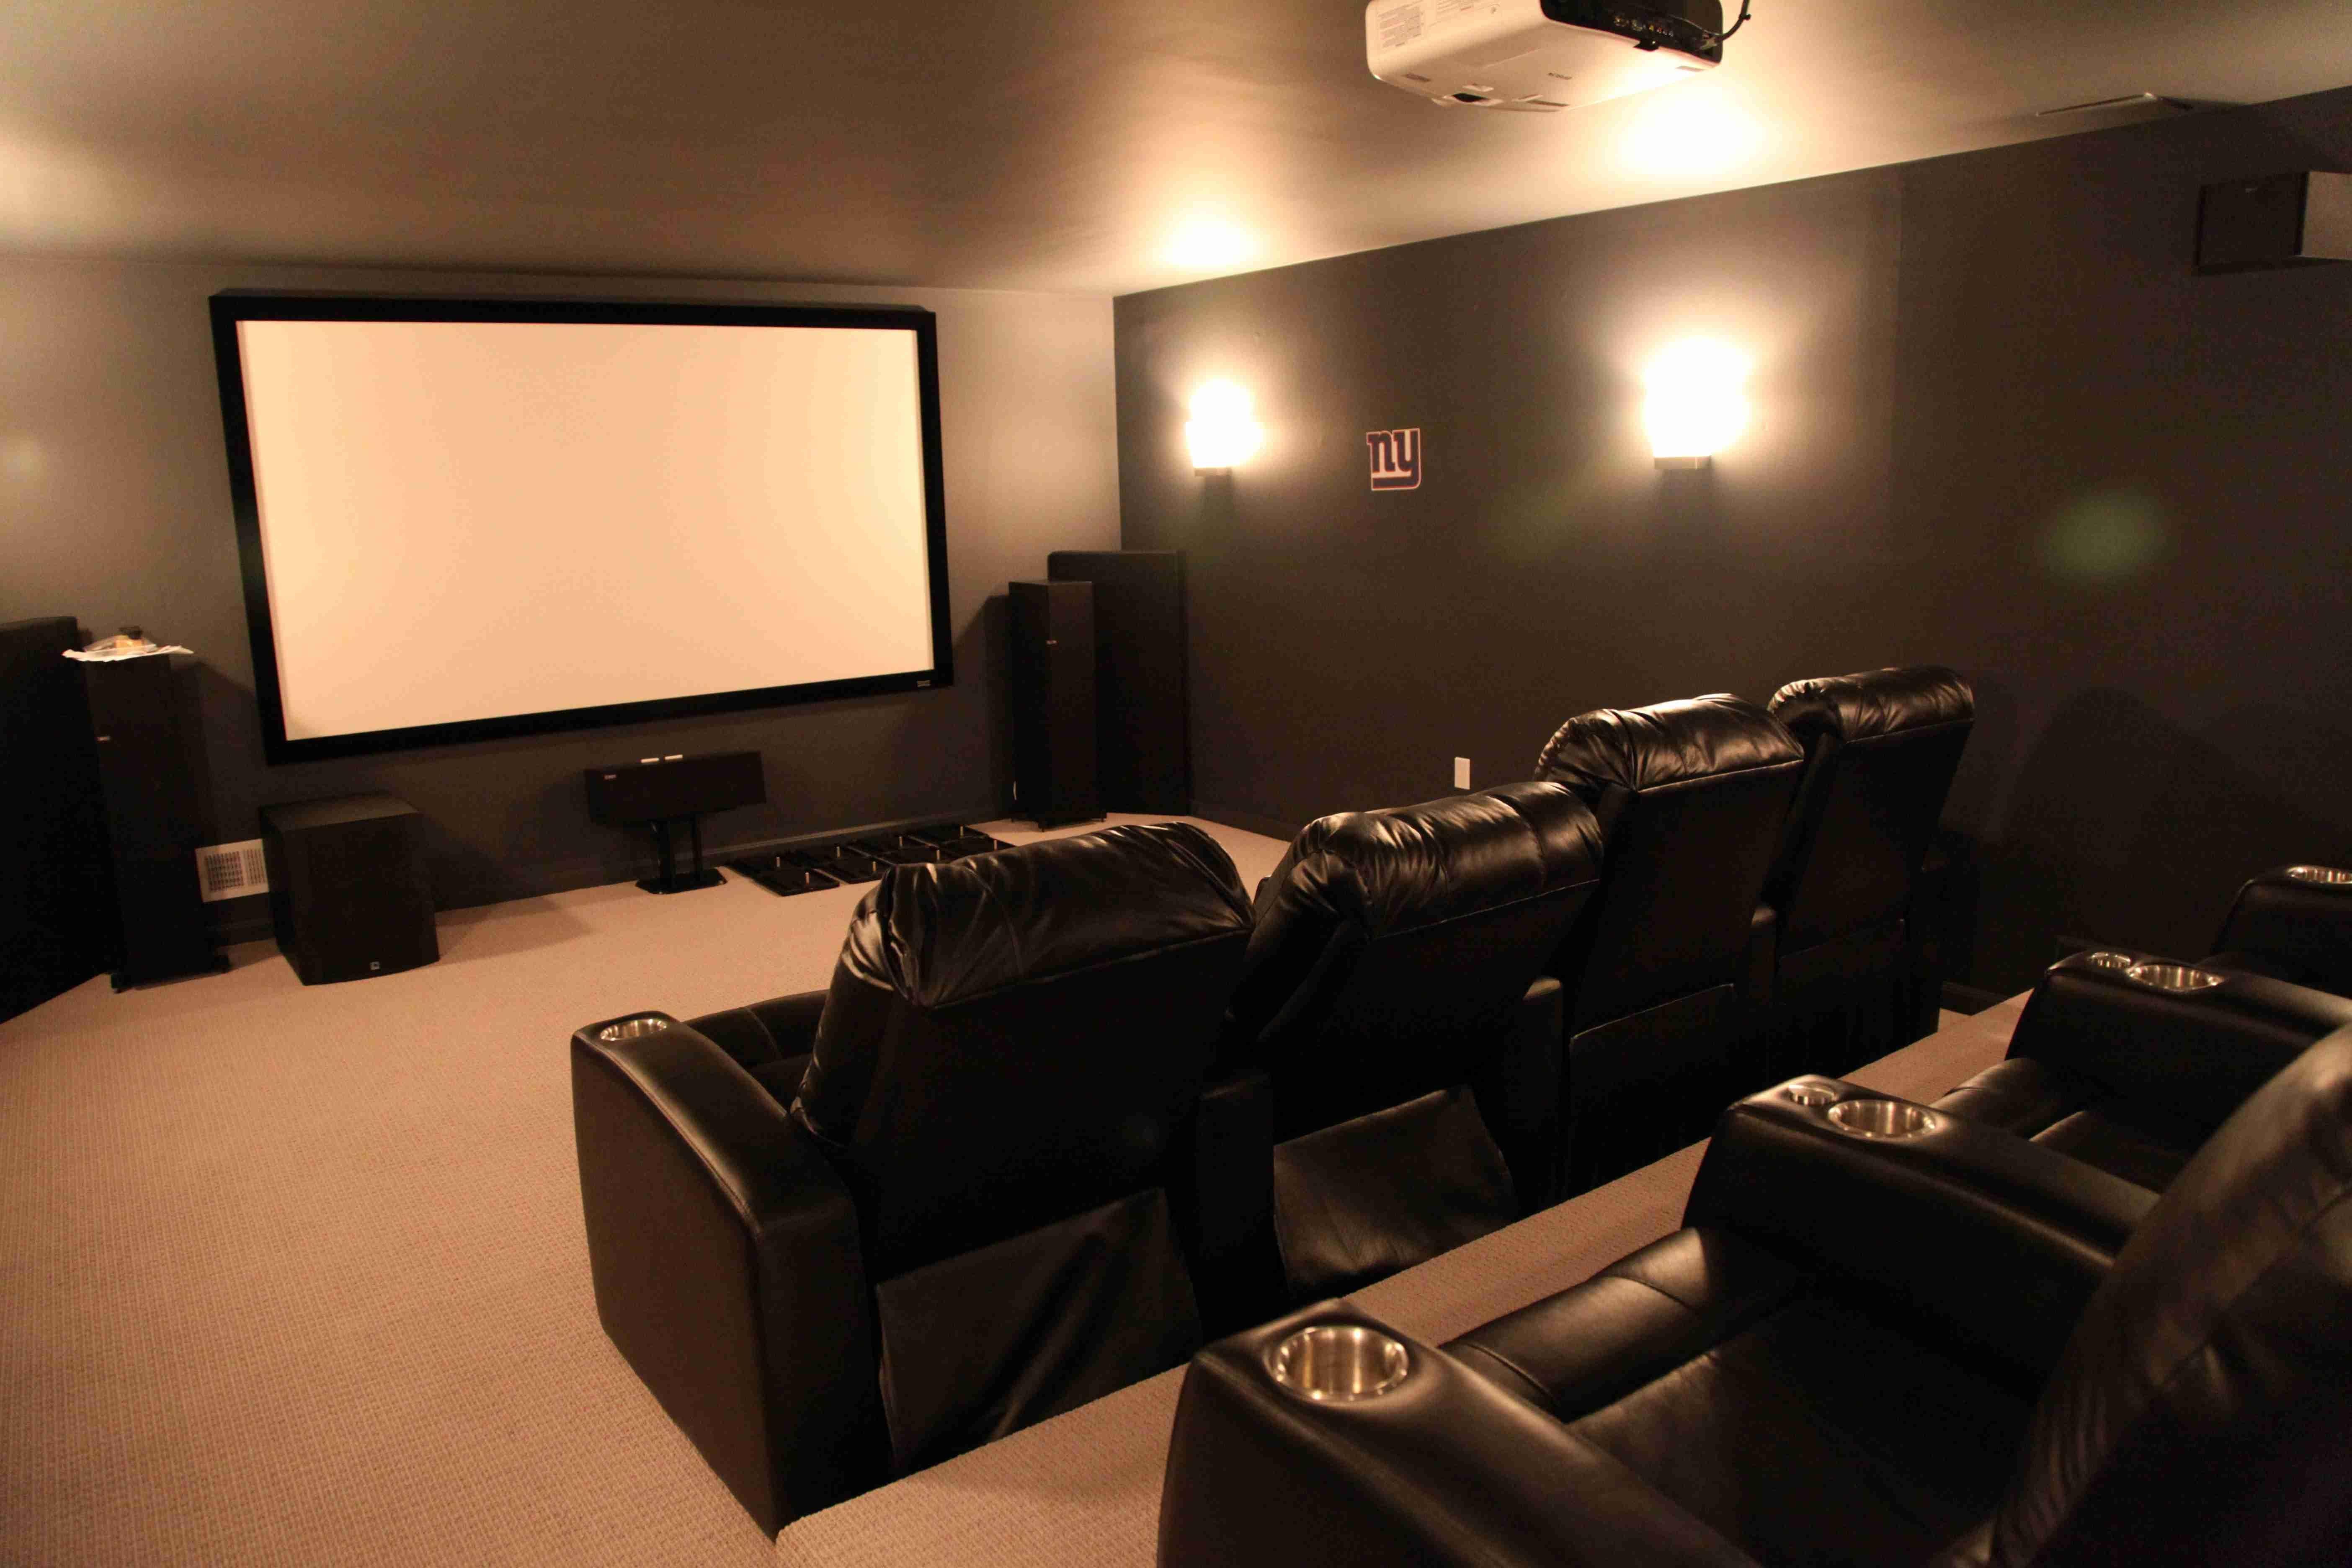 Design Home Theater - Create